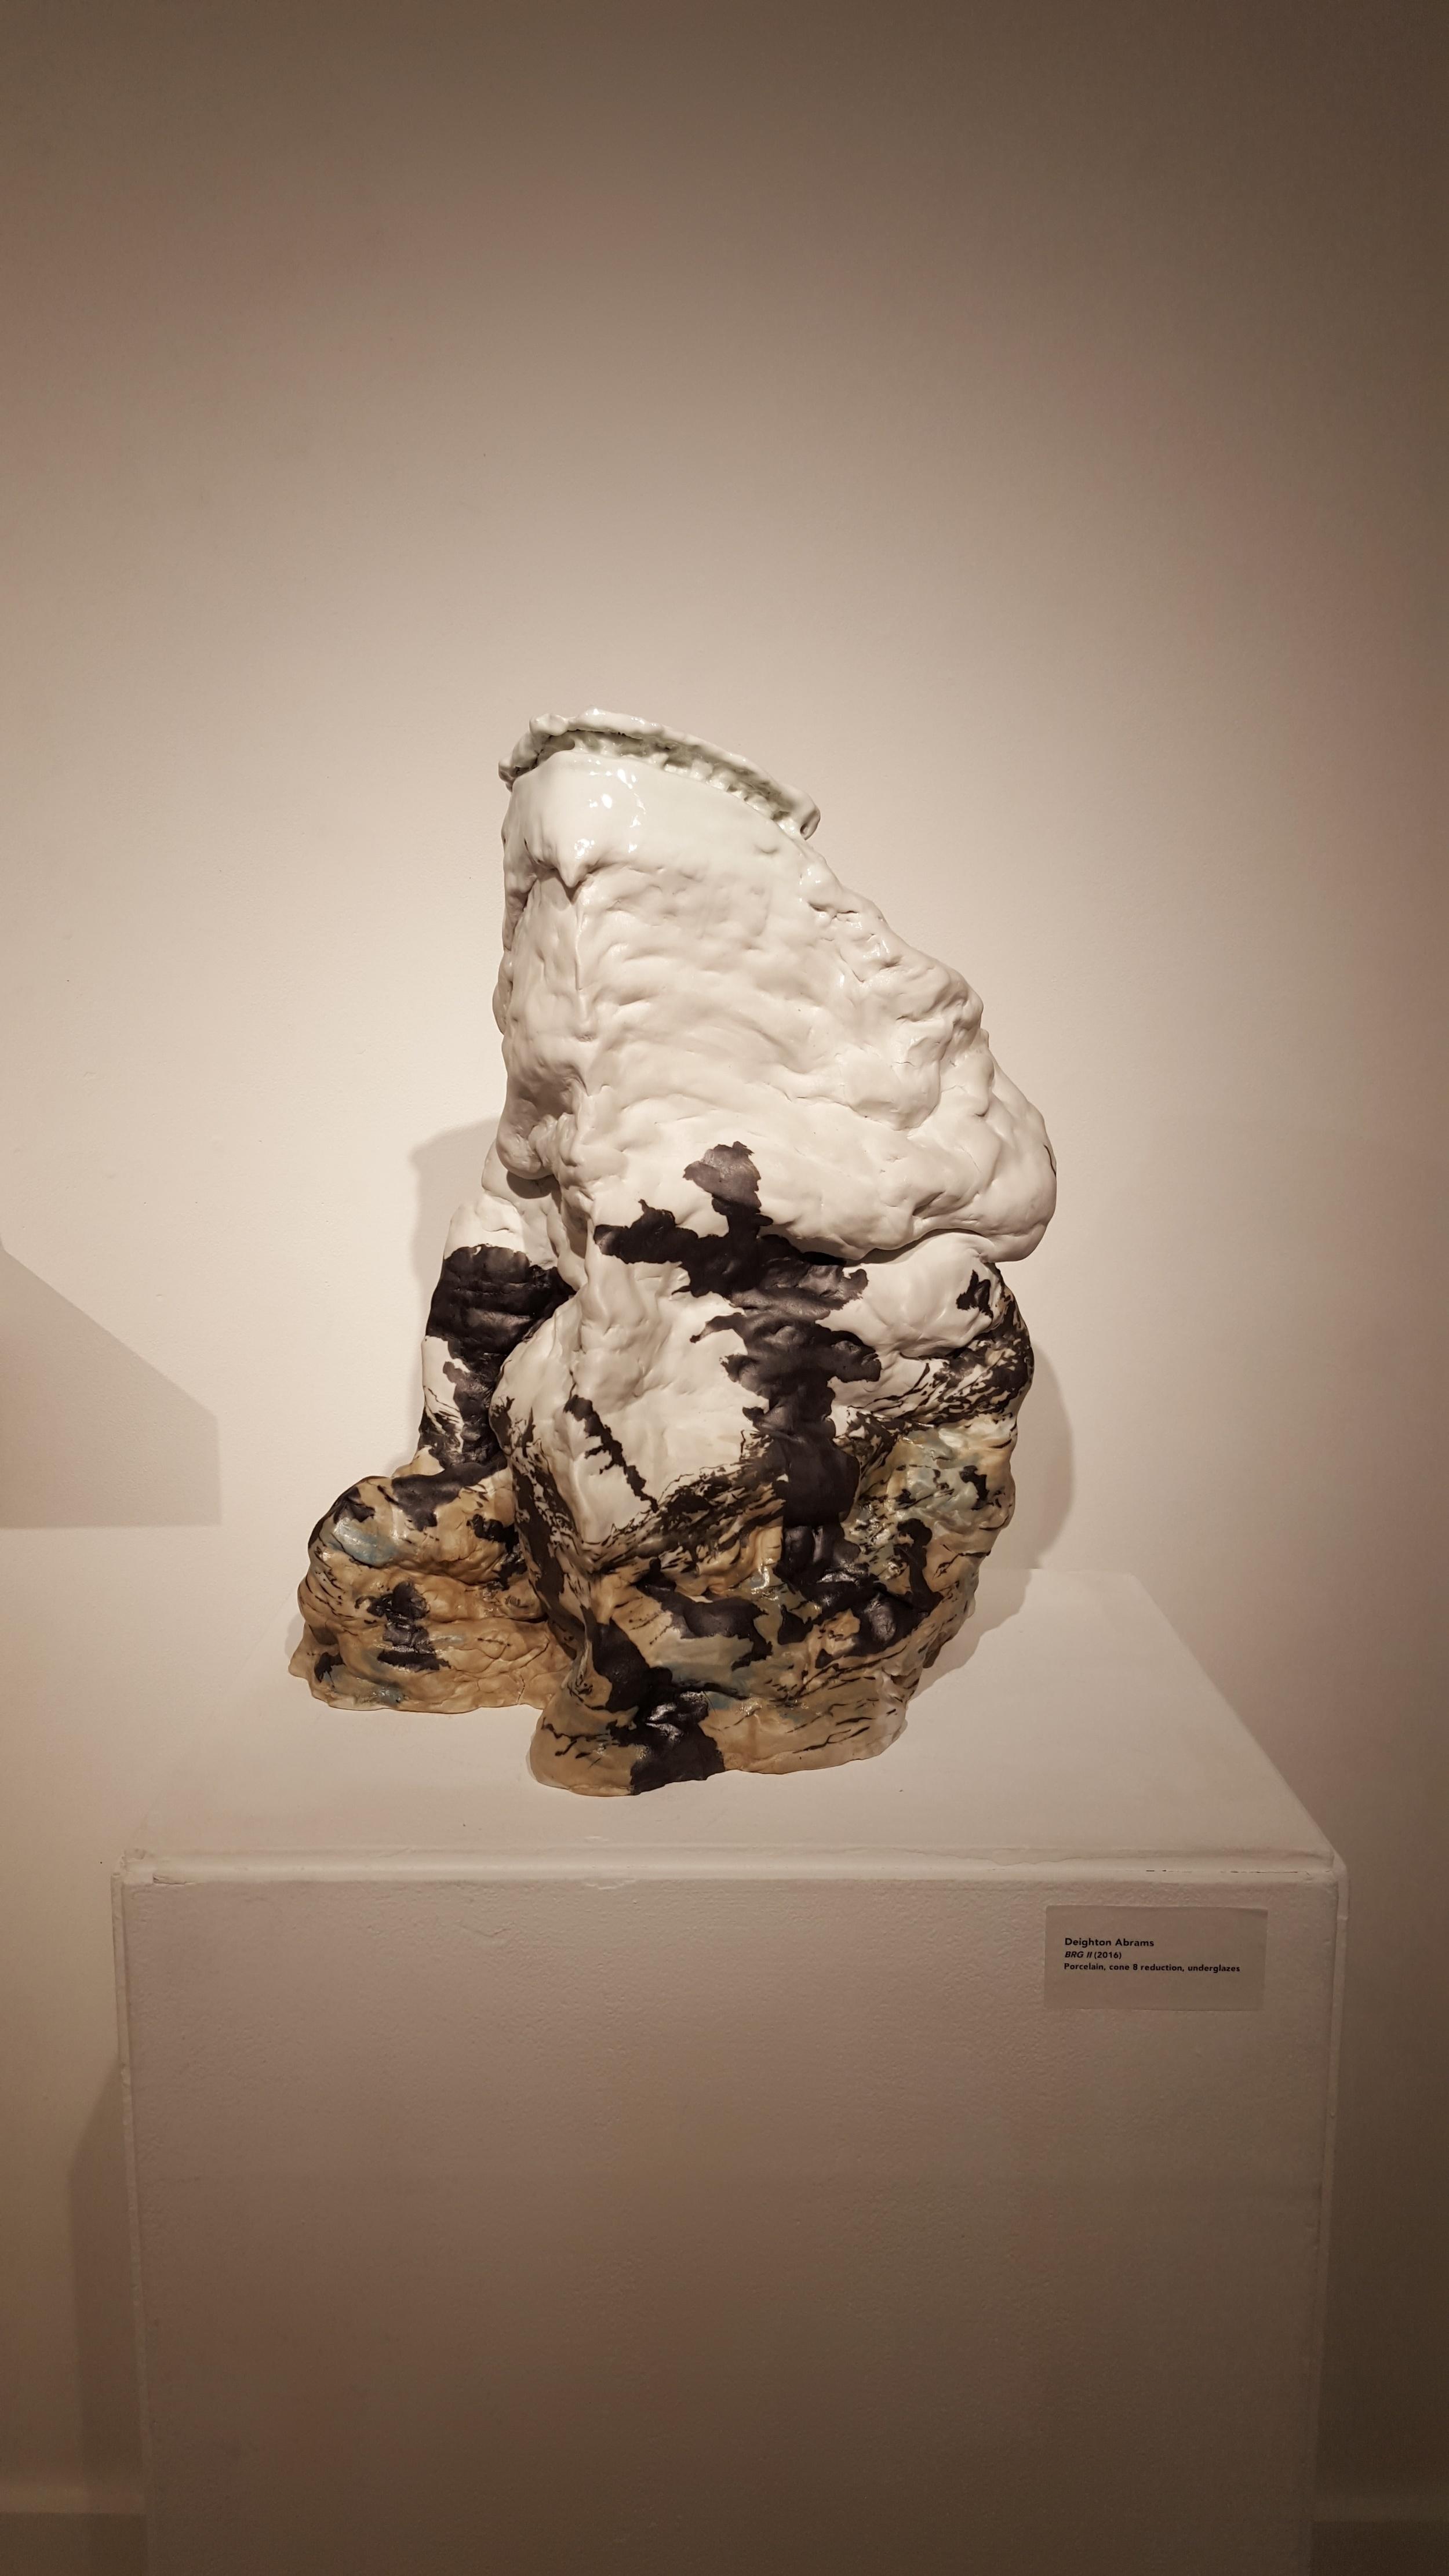 Ceramic Sculpture by Deighton Abrams